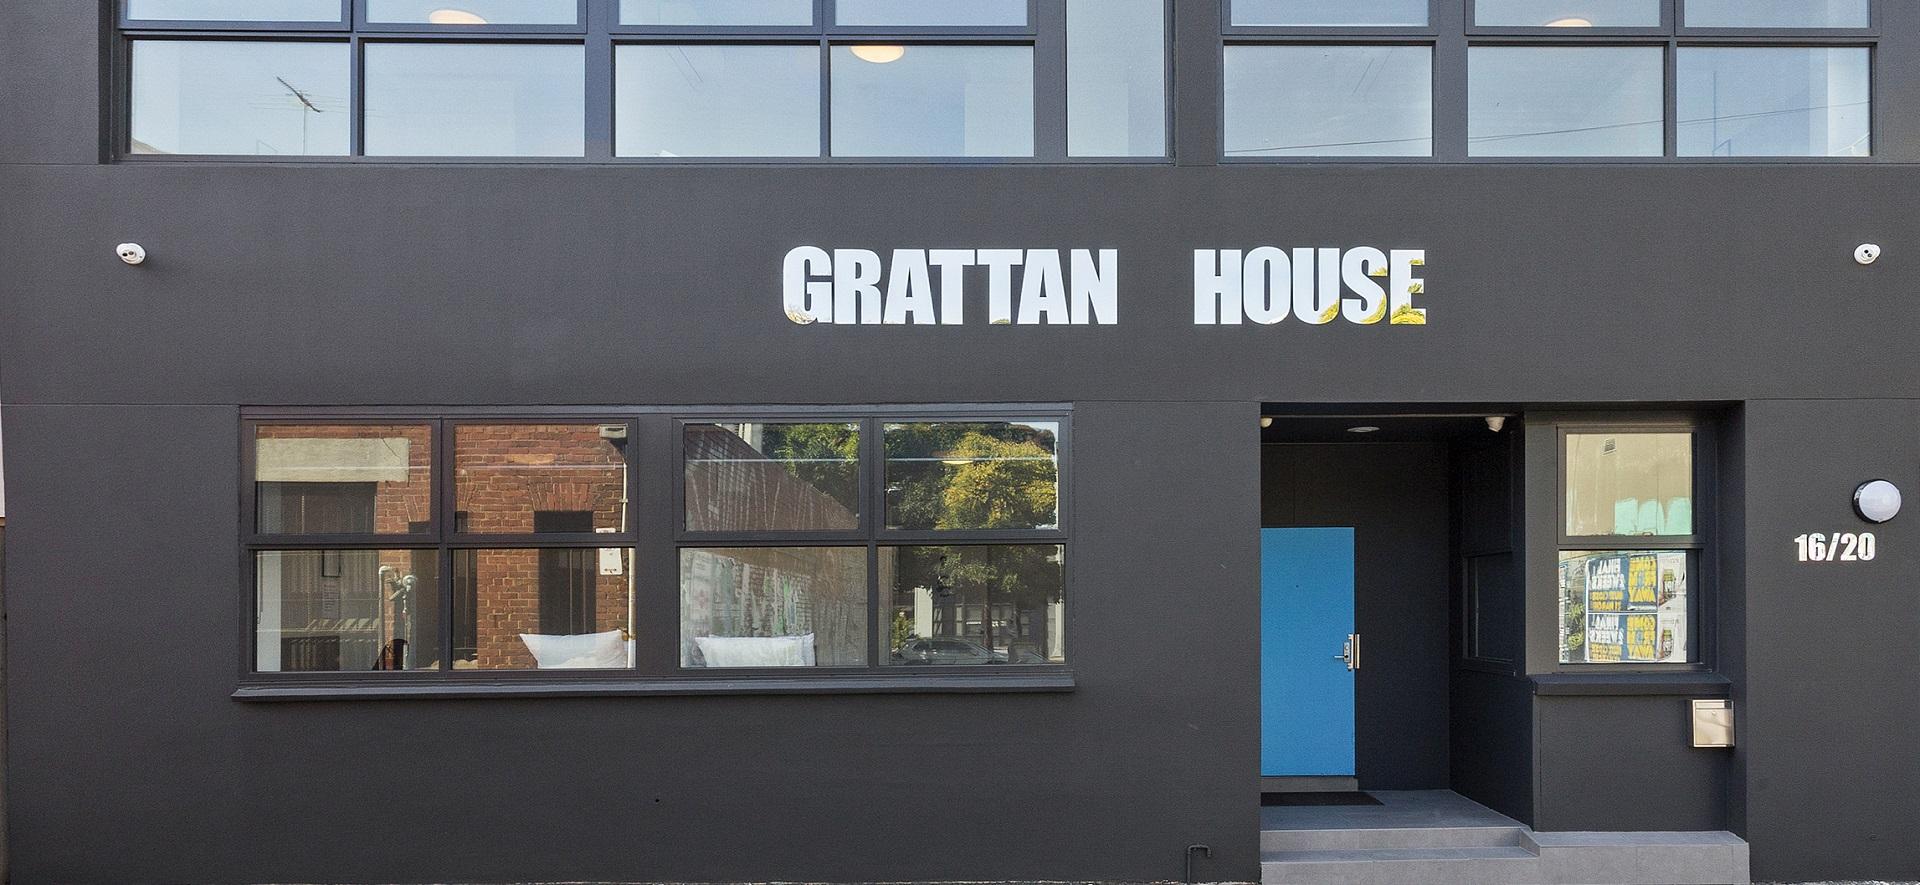 Grattan House Street View